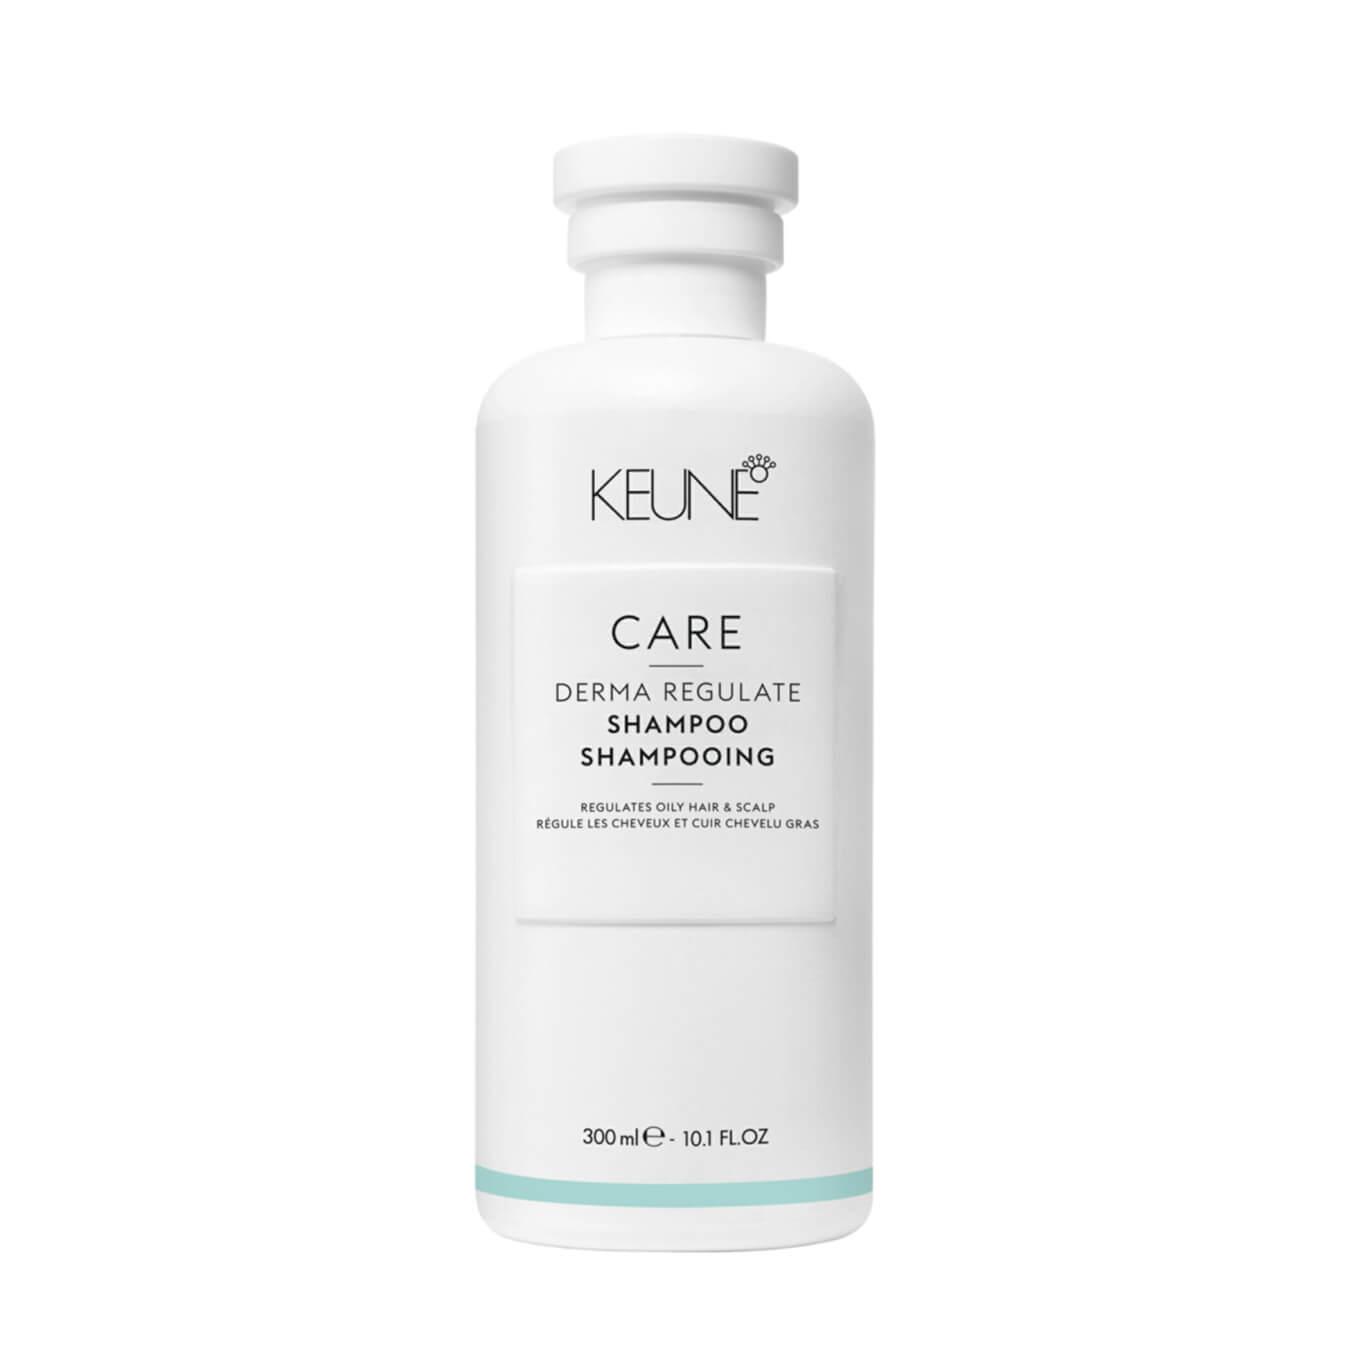 Kauf Keune Care Derma Regulate Shampoo 300ml